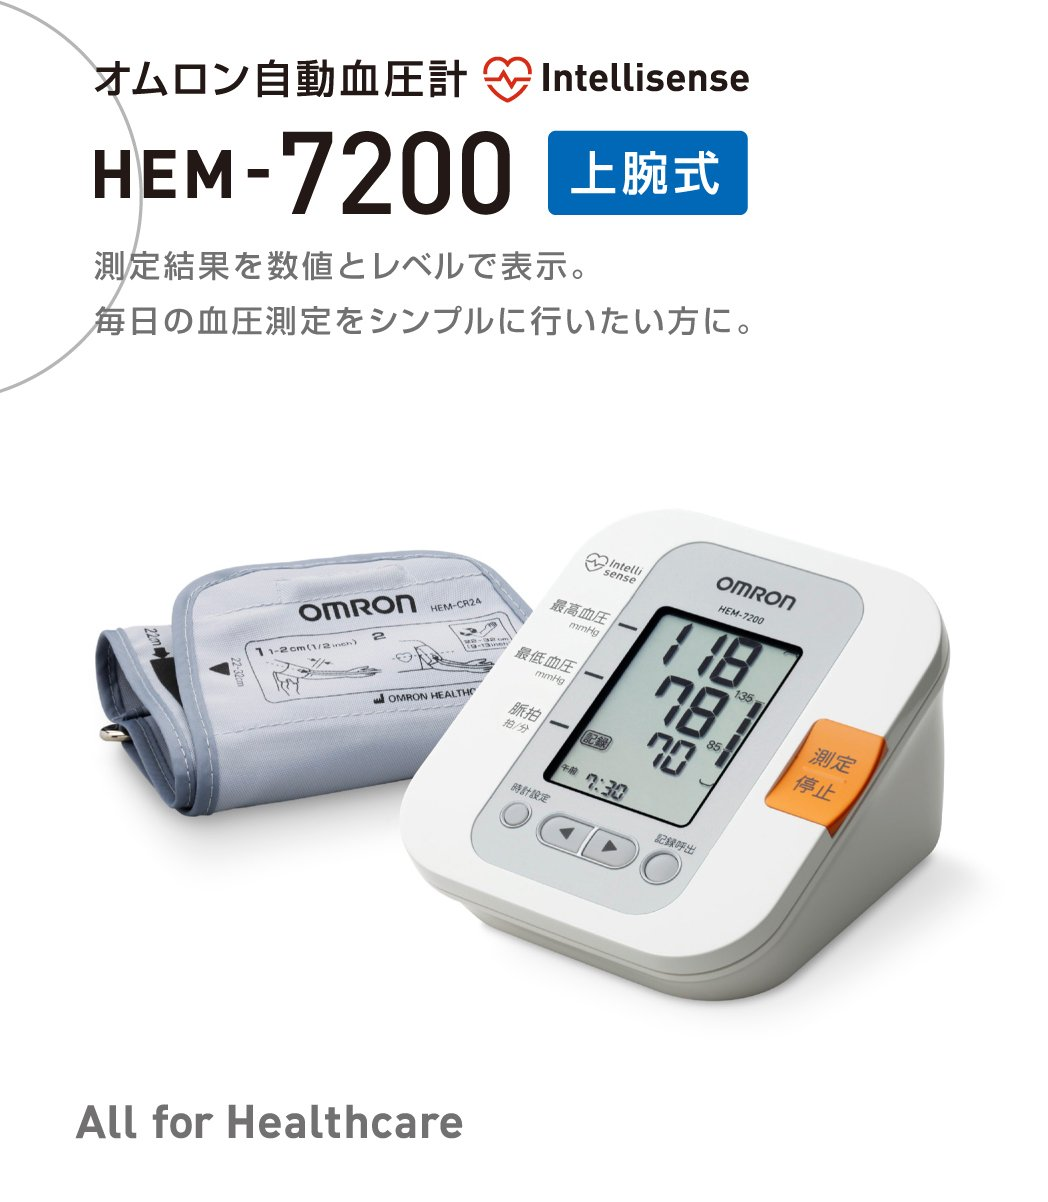 Omron 7200 automática - Tensiómetro de brazo: messp telefónico: Amazon.es: Hogar